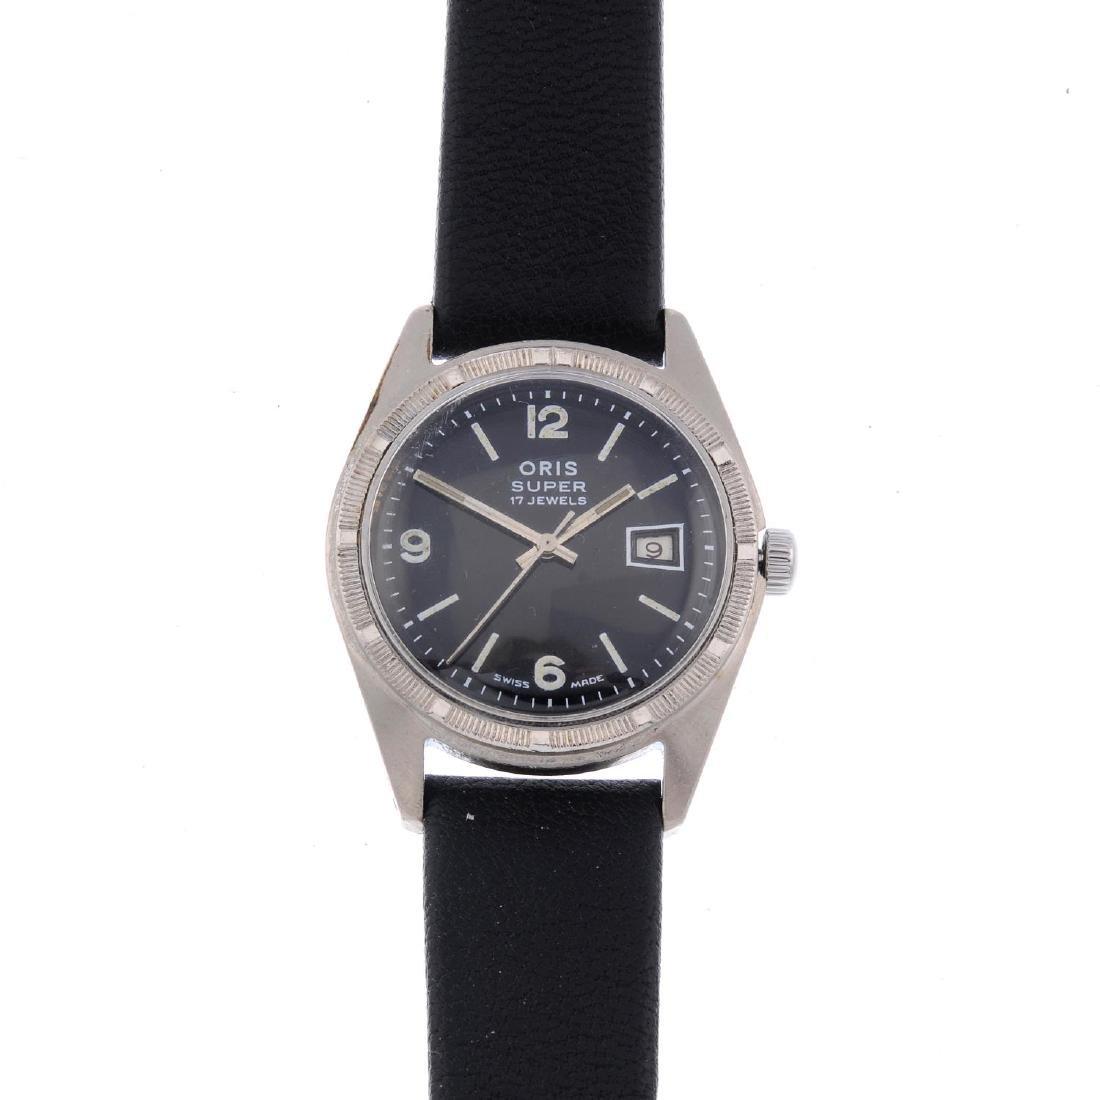 ORIS - a gentleman's Super wrist watch. Base metal case